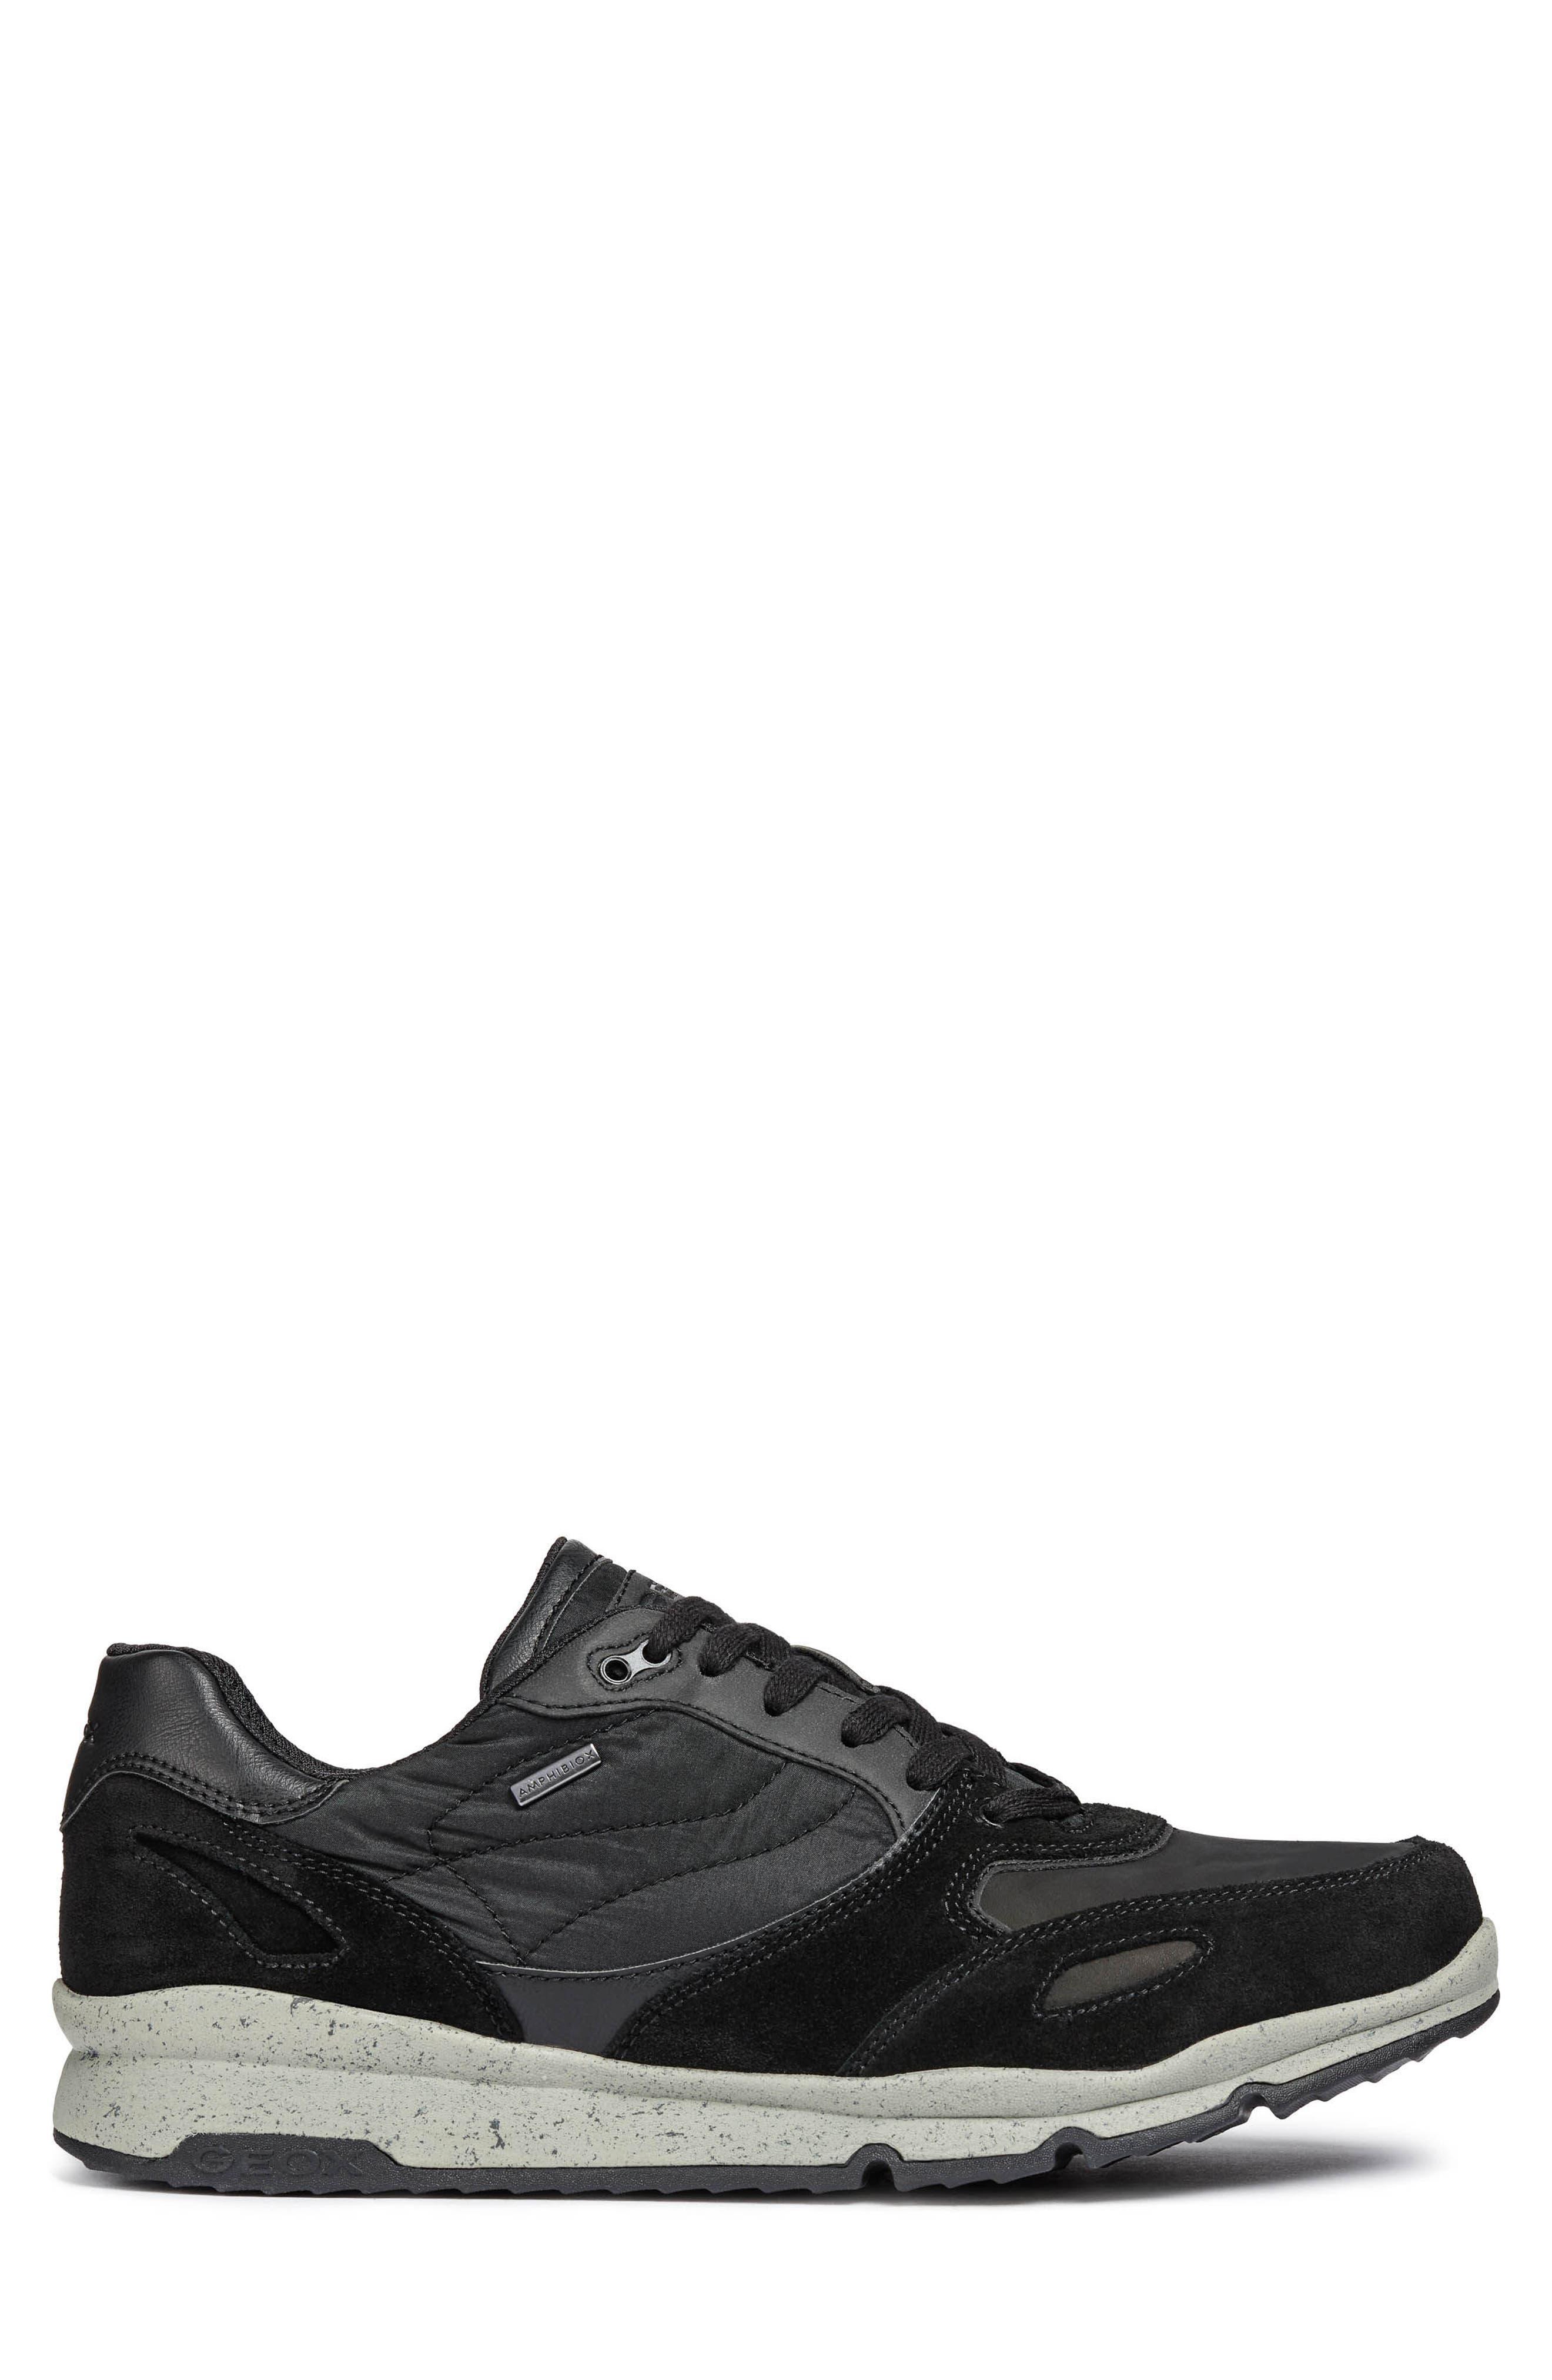 Sandro ABX Ambphibiox Waterproof Sneaker,                             Alternate thumbnail 3, color,                             007